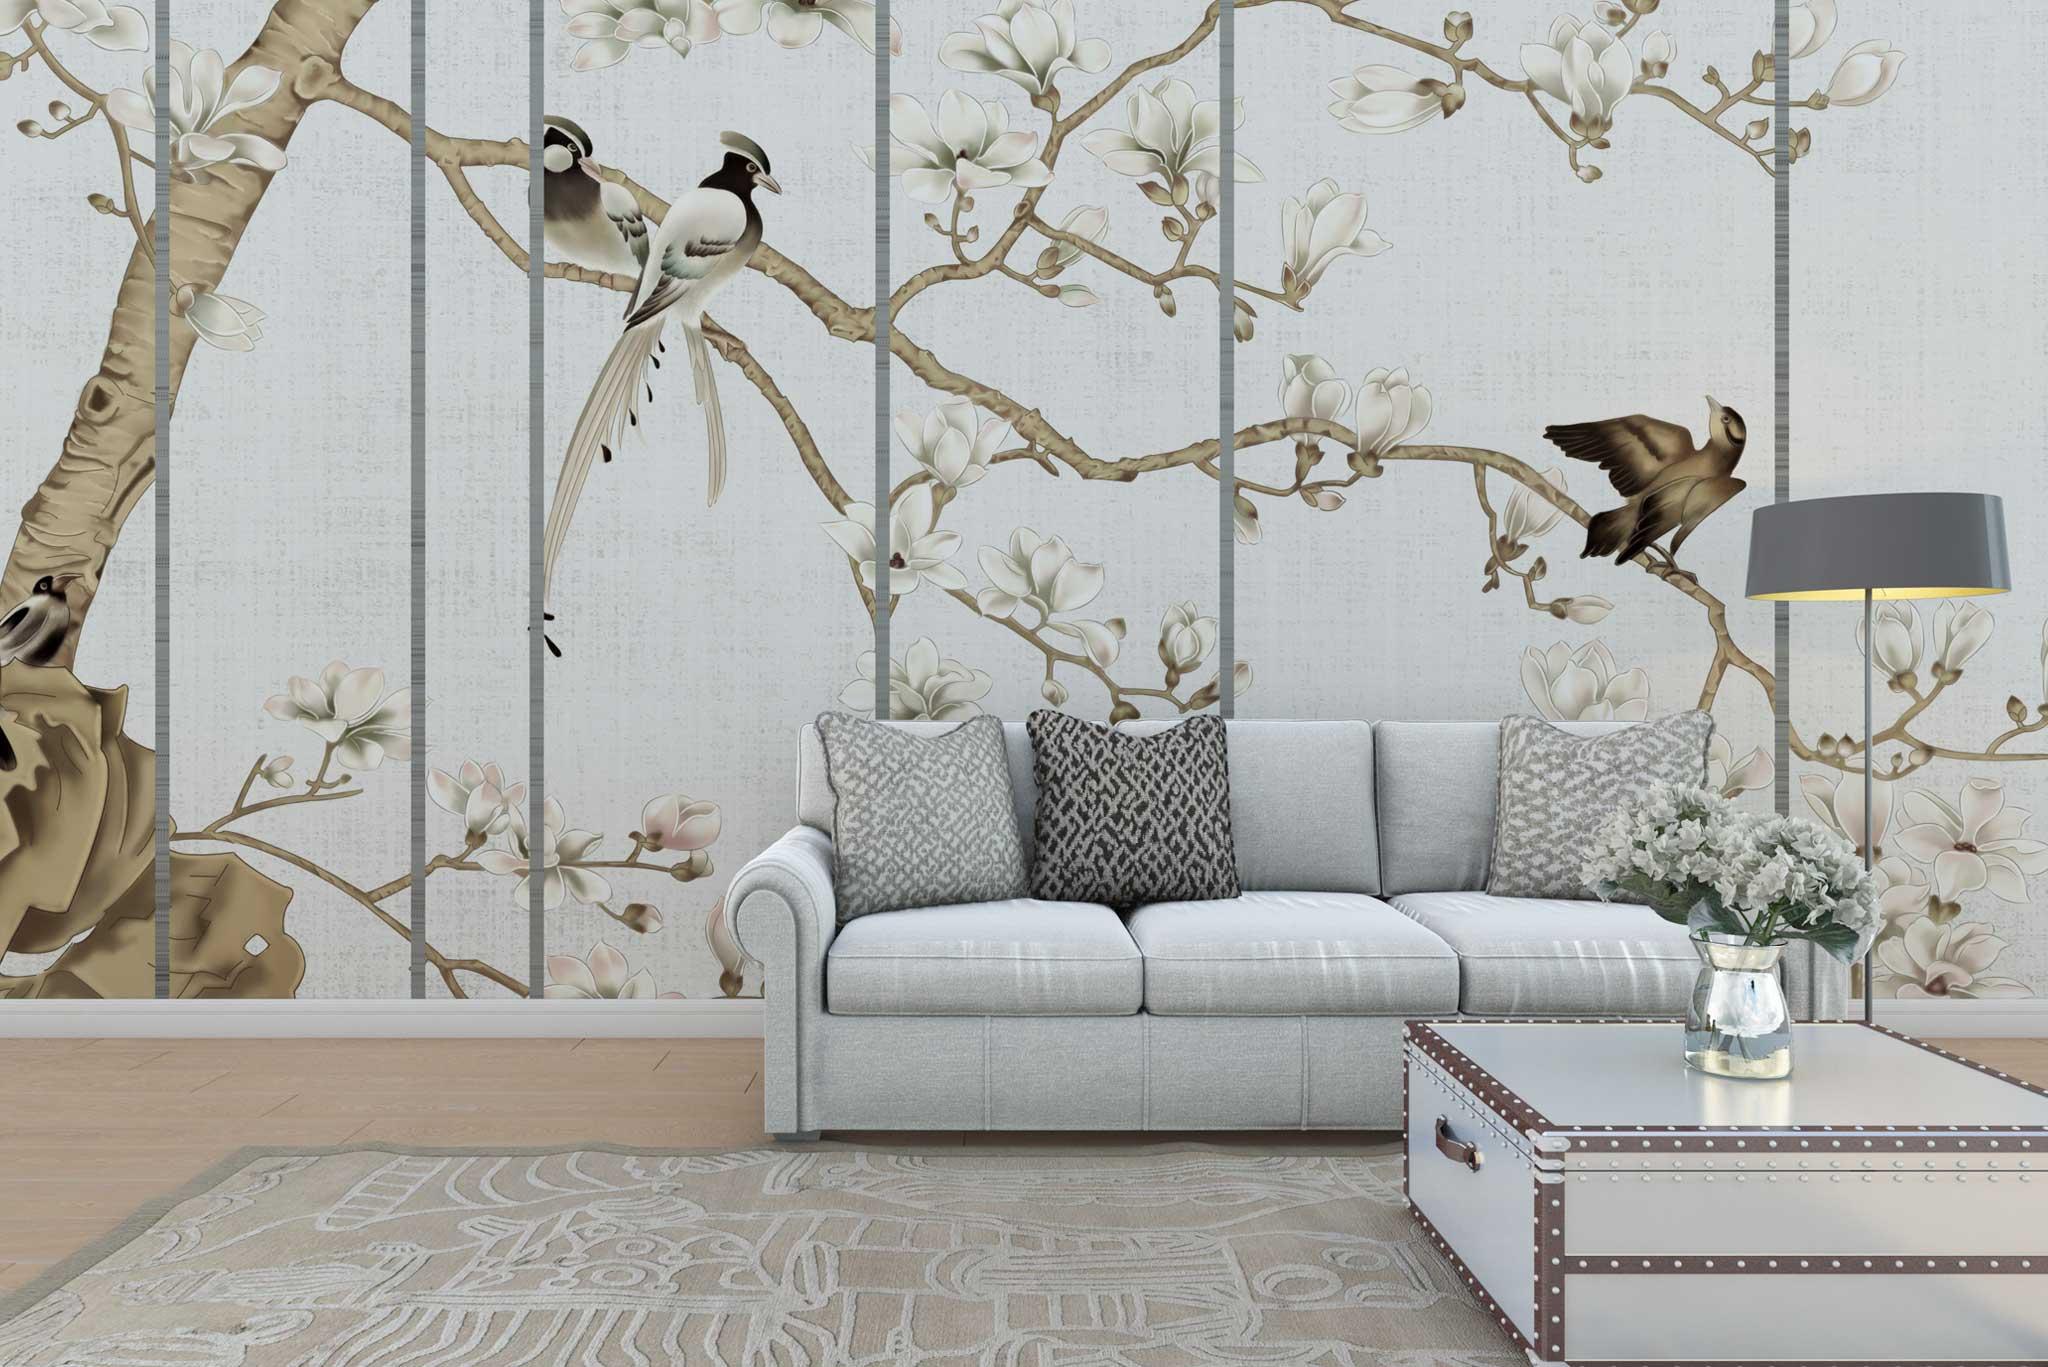 tapet-fototapet-personalizat-comanda-bucuresti-model-chinoiserie-pasari-magnolii-crem-perete-lux-special